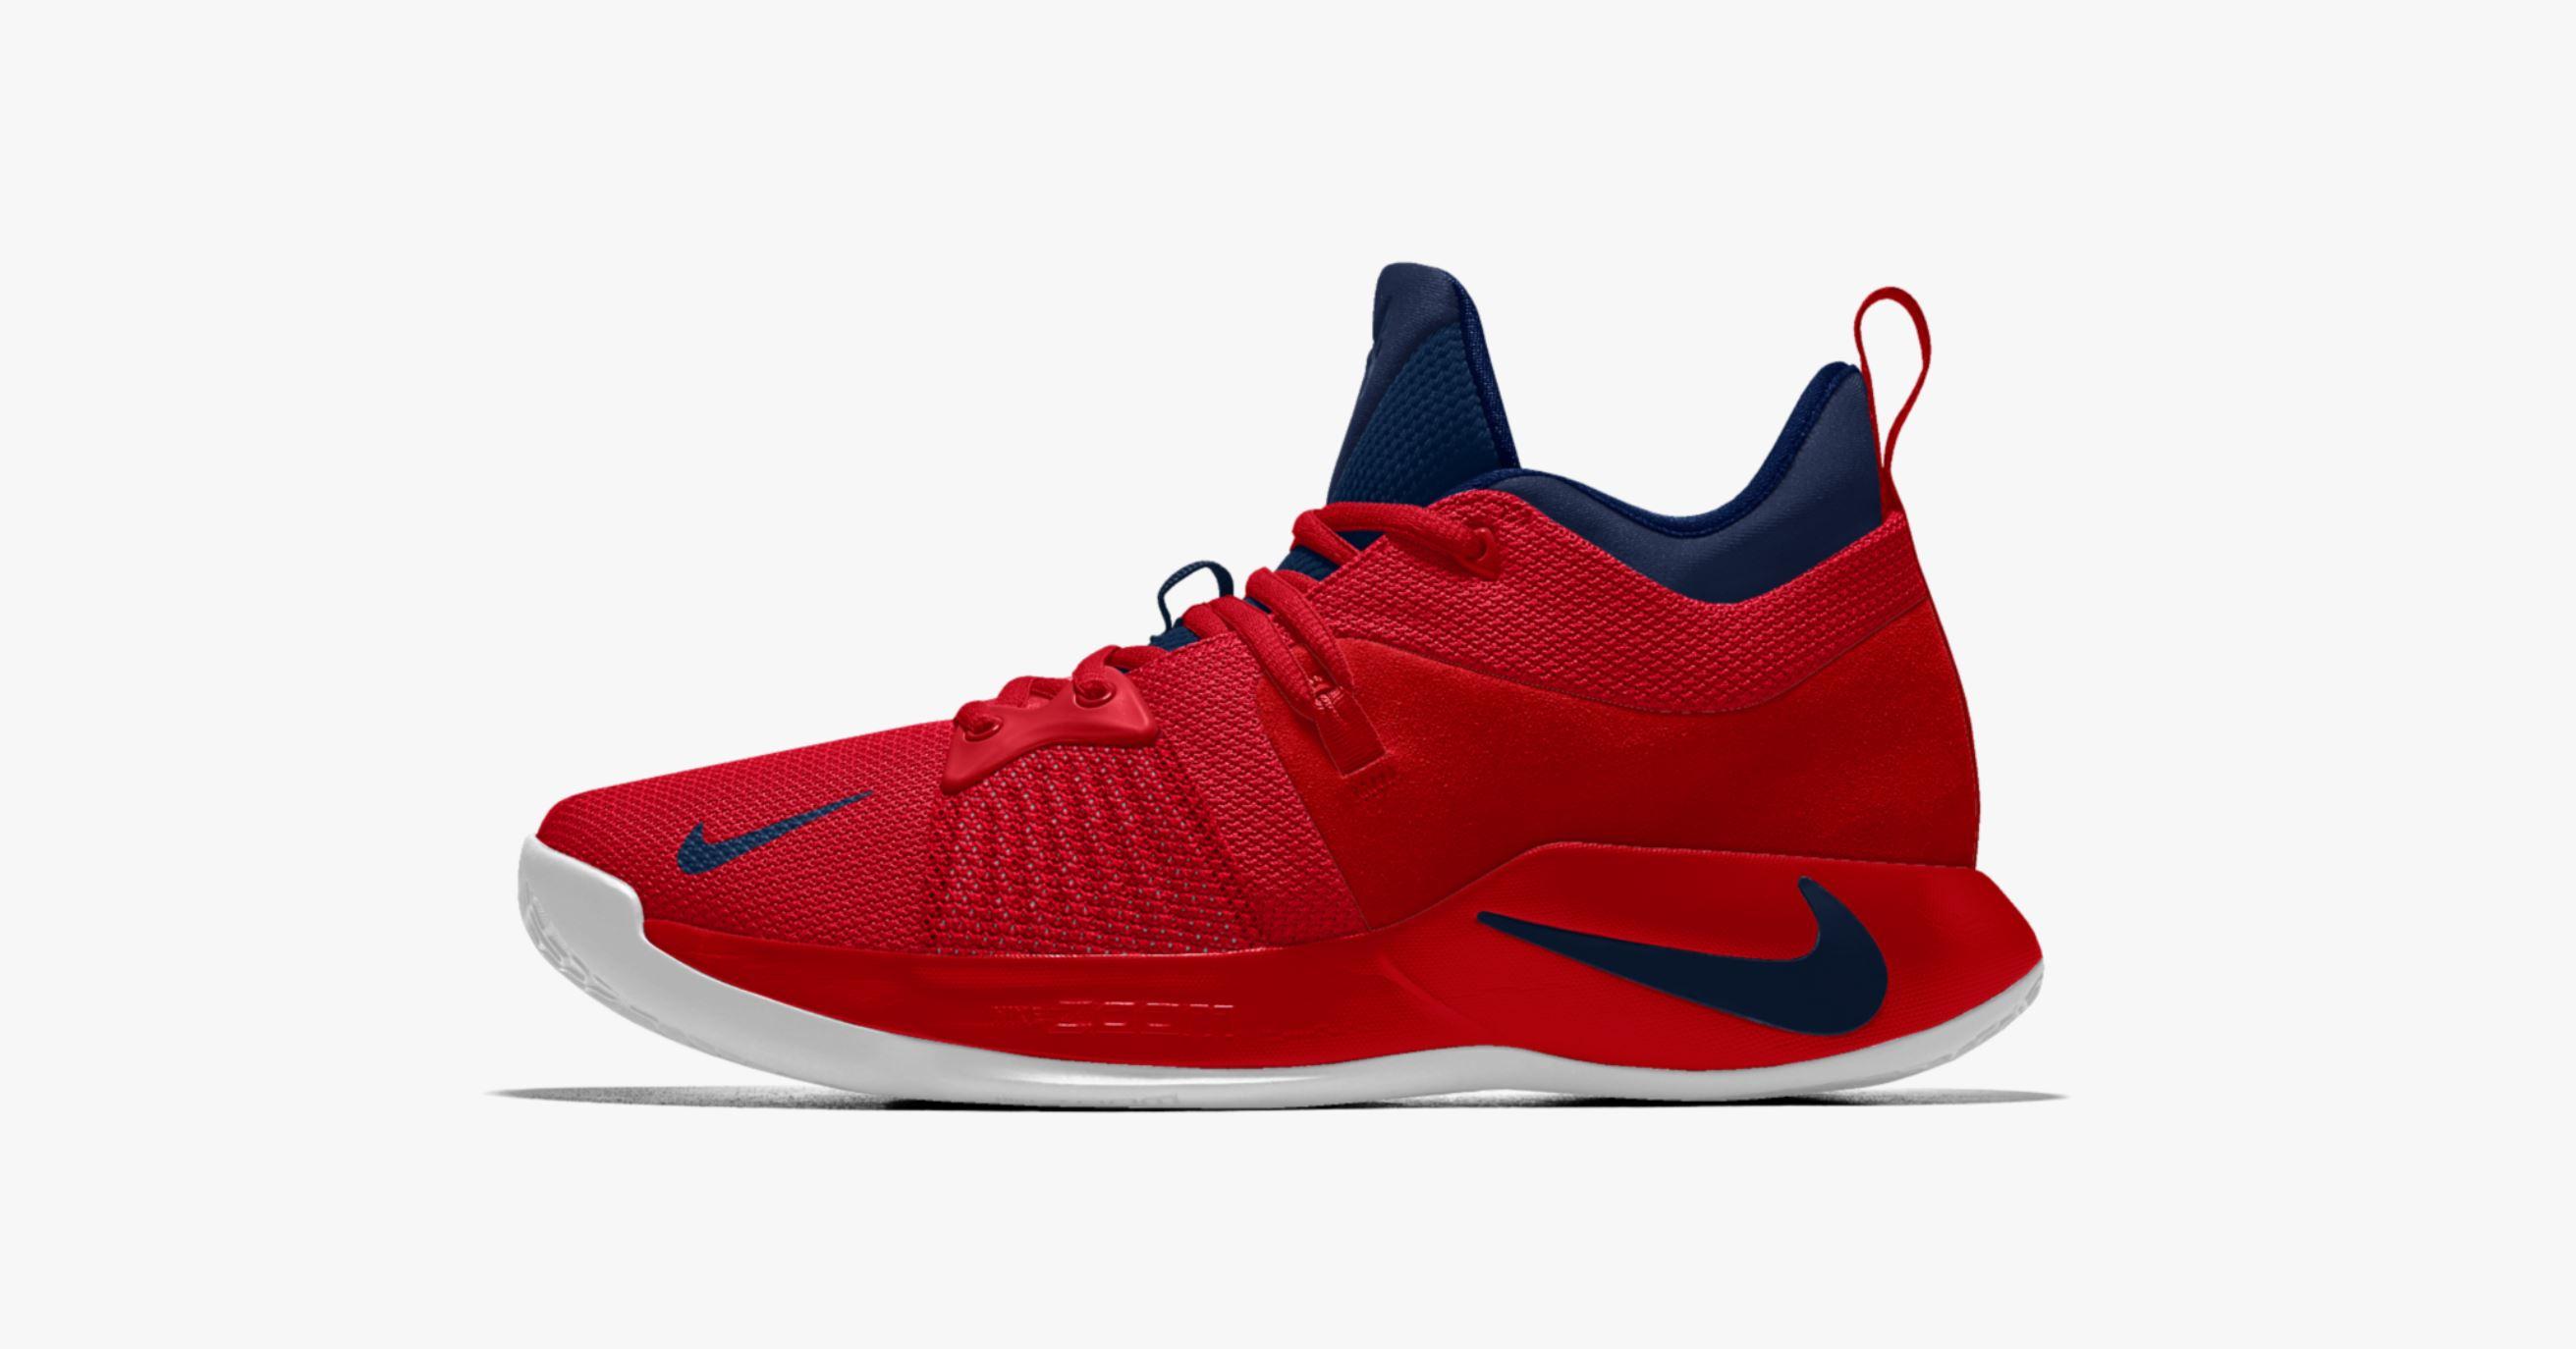 cff496442e7 ... customization platform is the Air Max 270. nike pg 2 nikeid 3 · Kicks  On Court   Nike   NikeiD ...